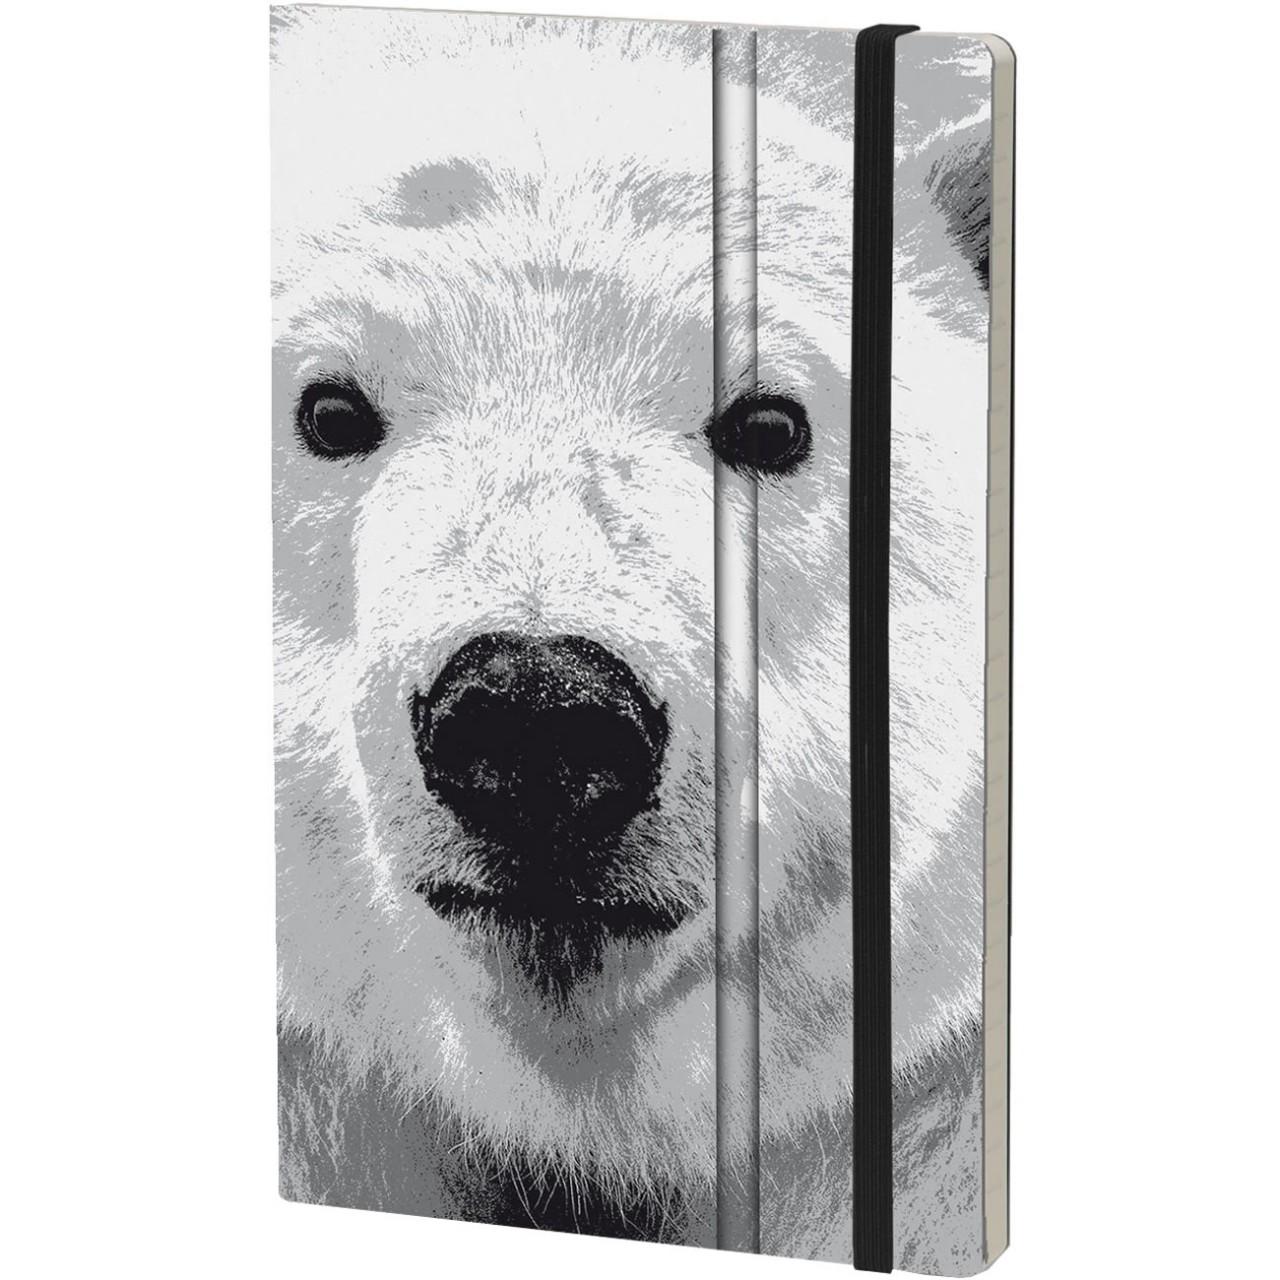 Stifflexible Notizbuch WILD PEARL 13 x 21 cm 192 S., POLAR BEAR